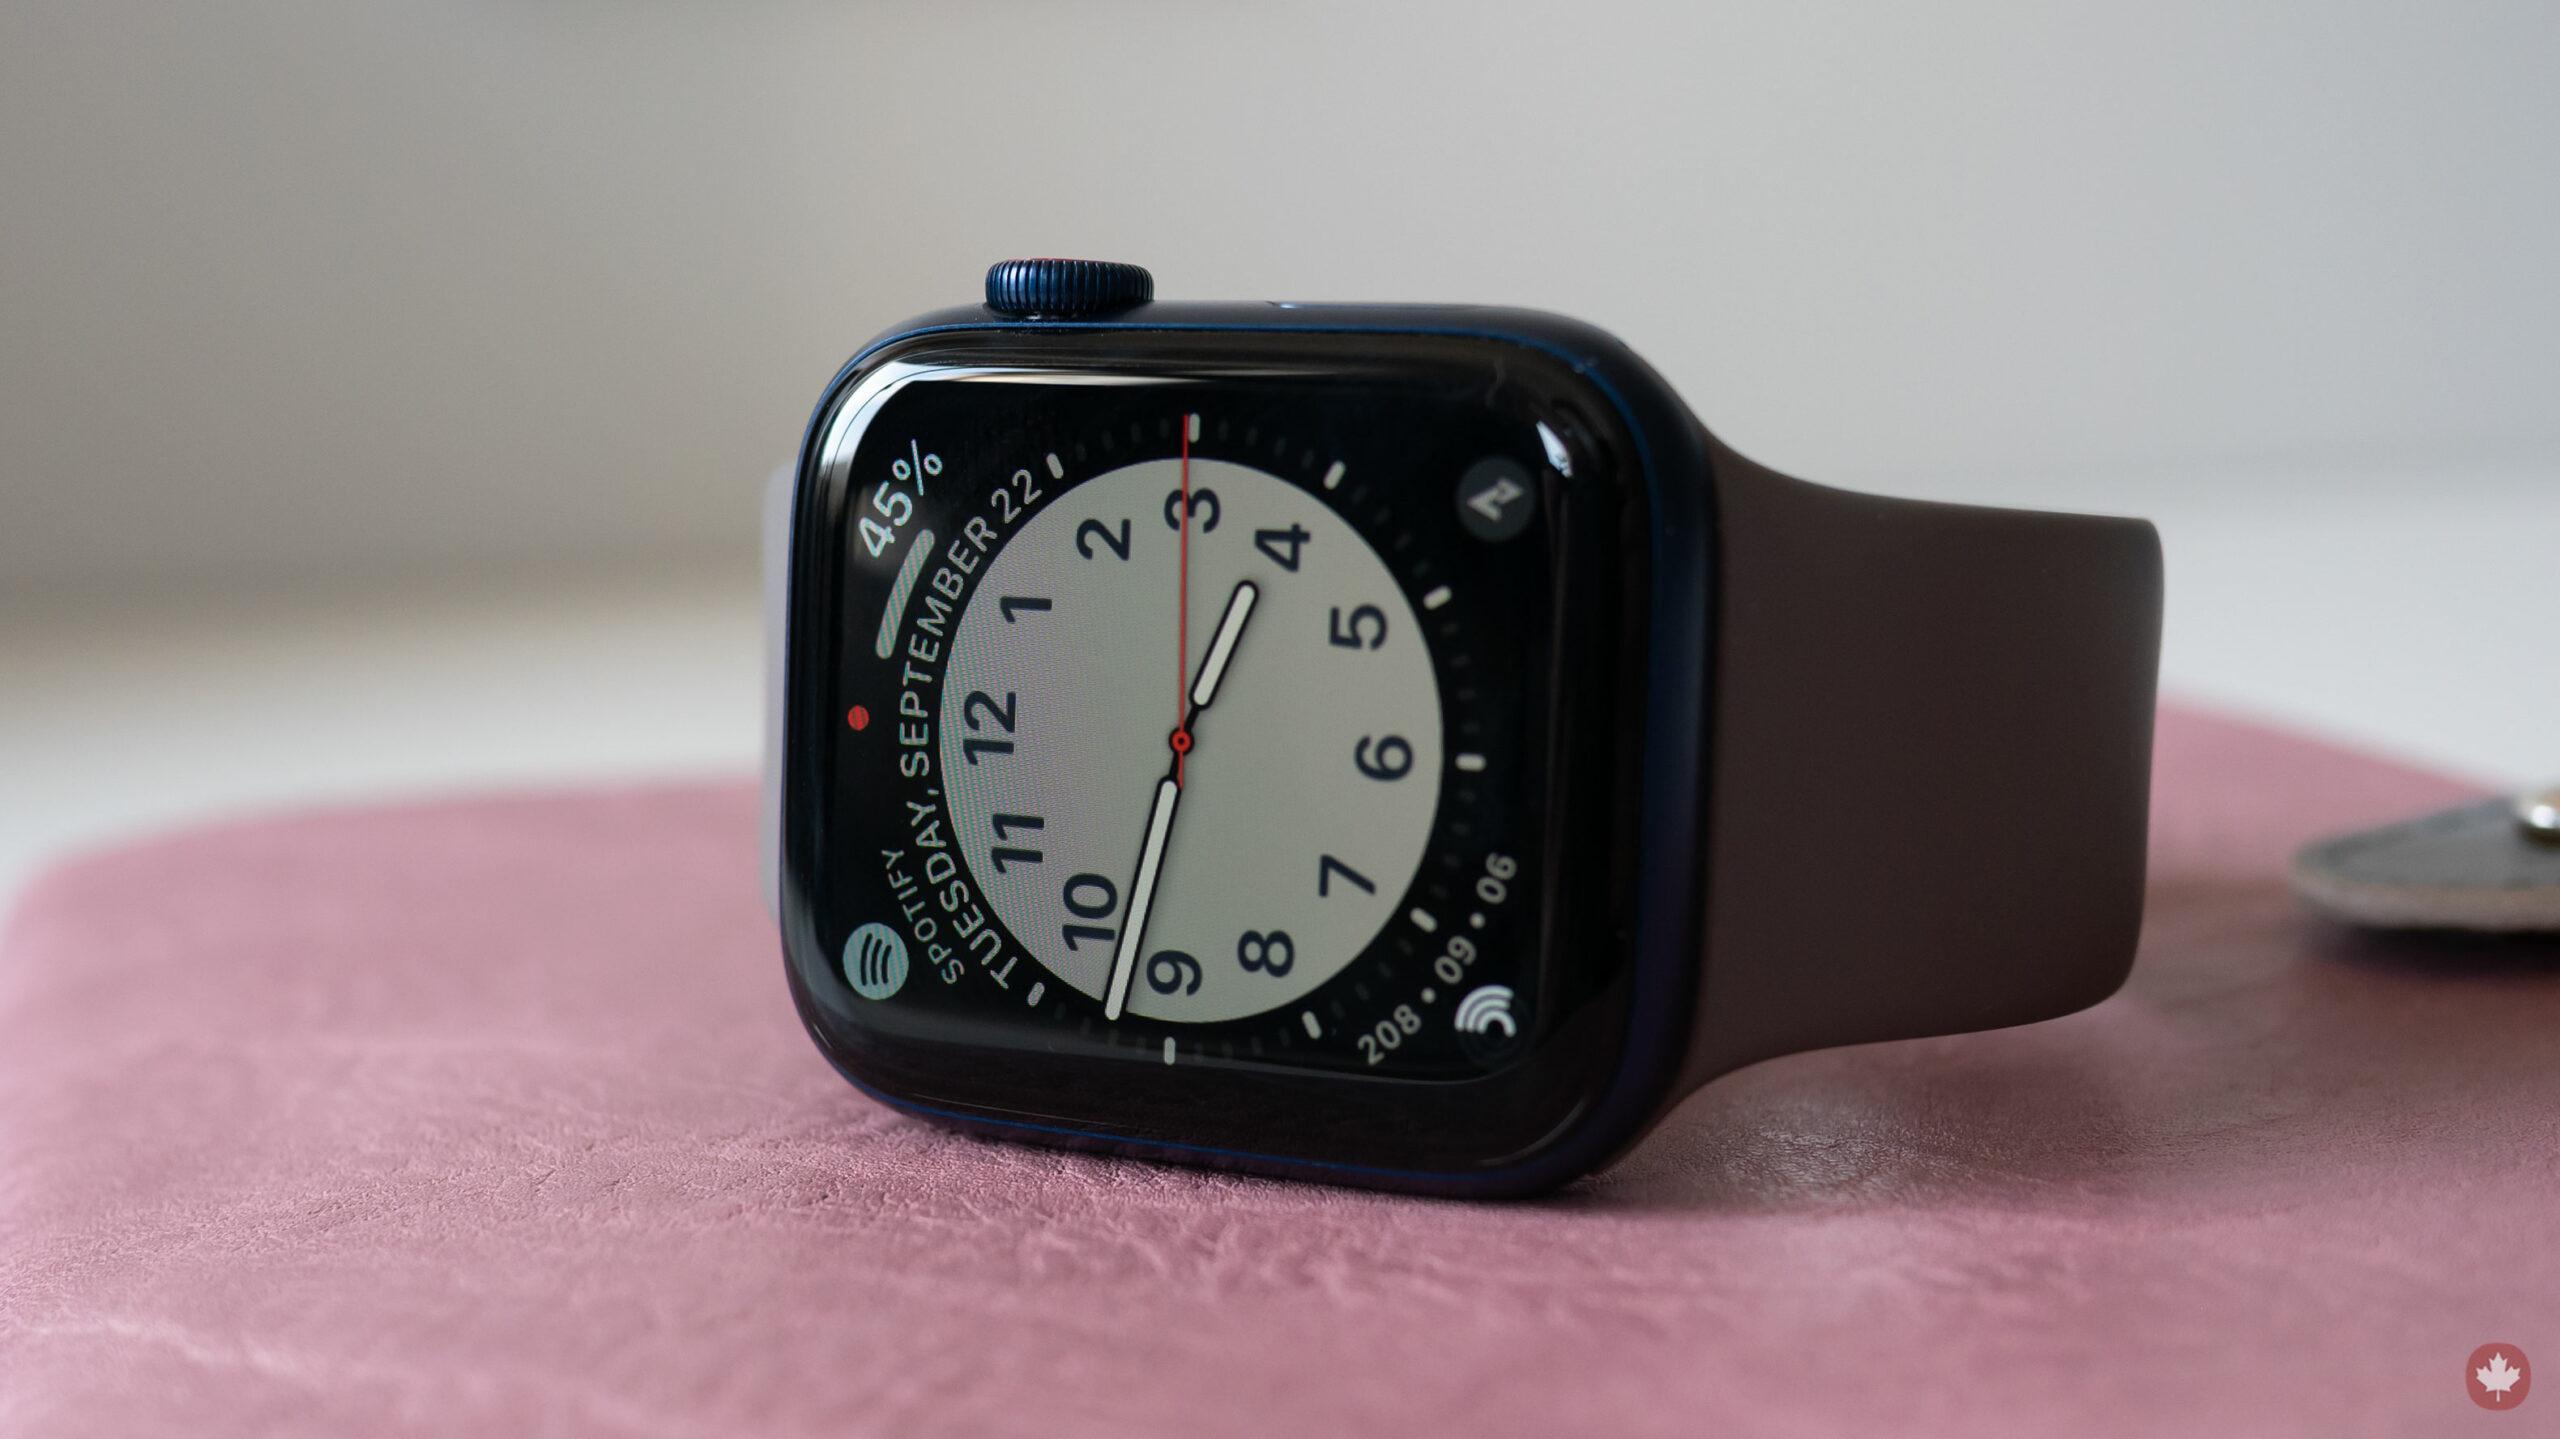 Apple Watch Series 6 on its side